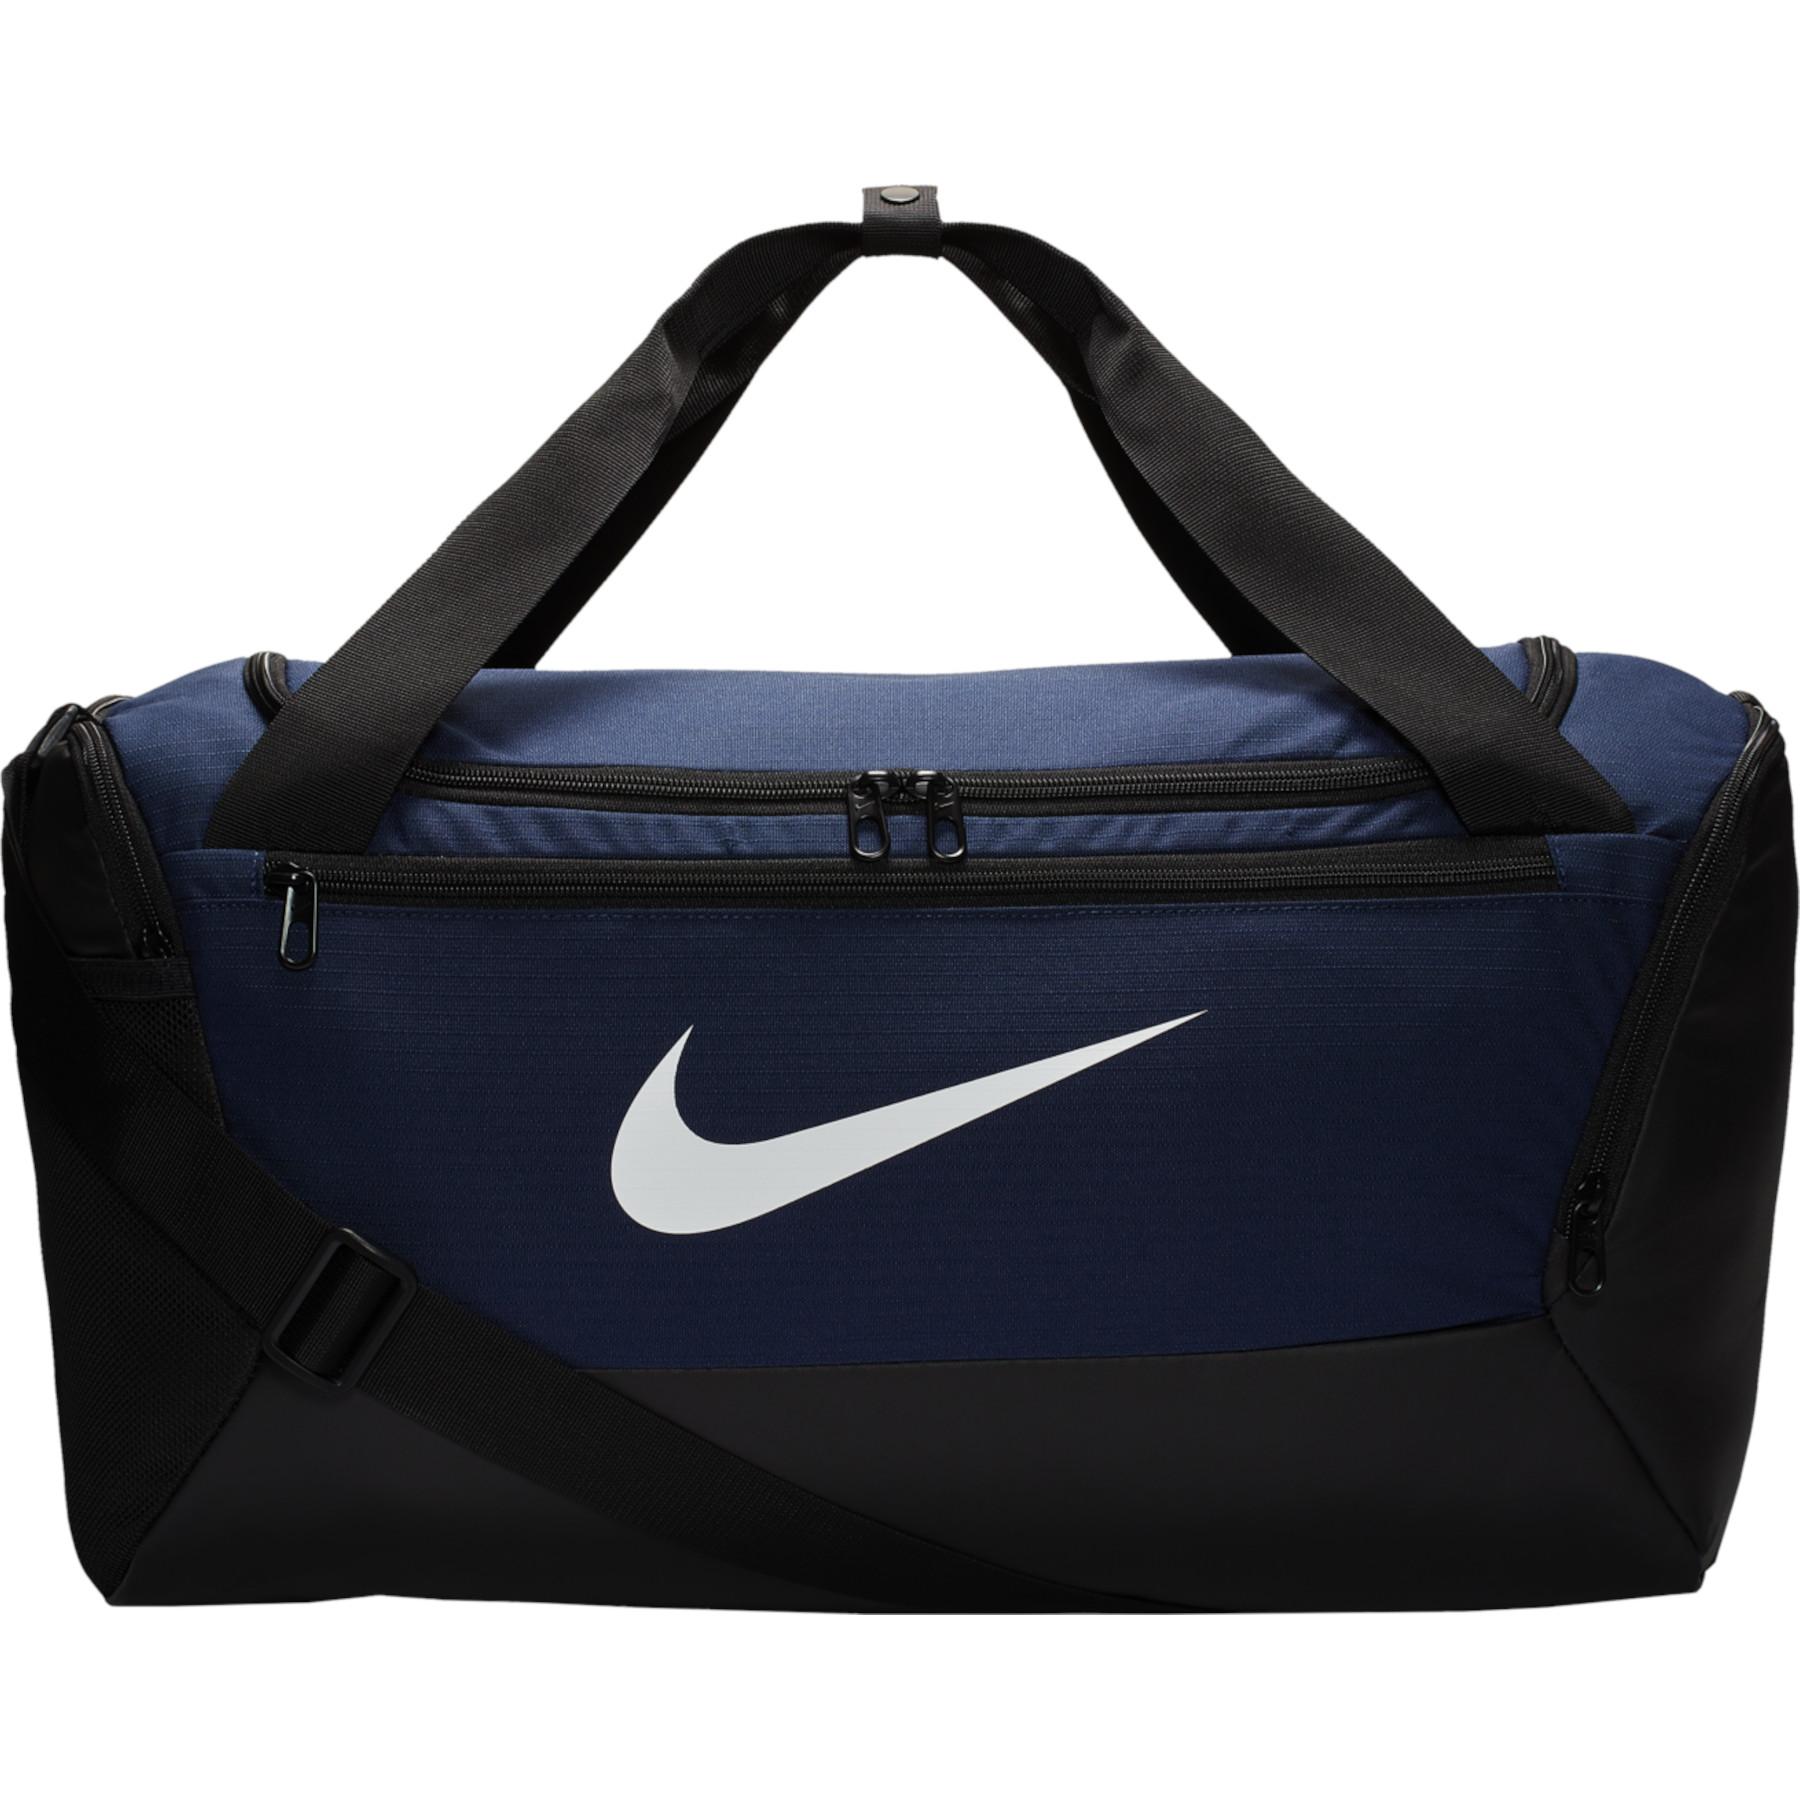 Picture of Nike Brasilia Training Duffel Bag (Small) - midnight navy/black/white BA5957-410